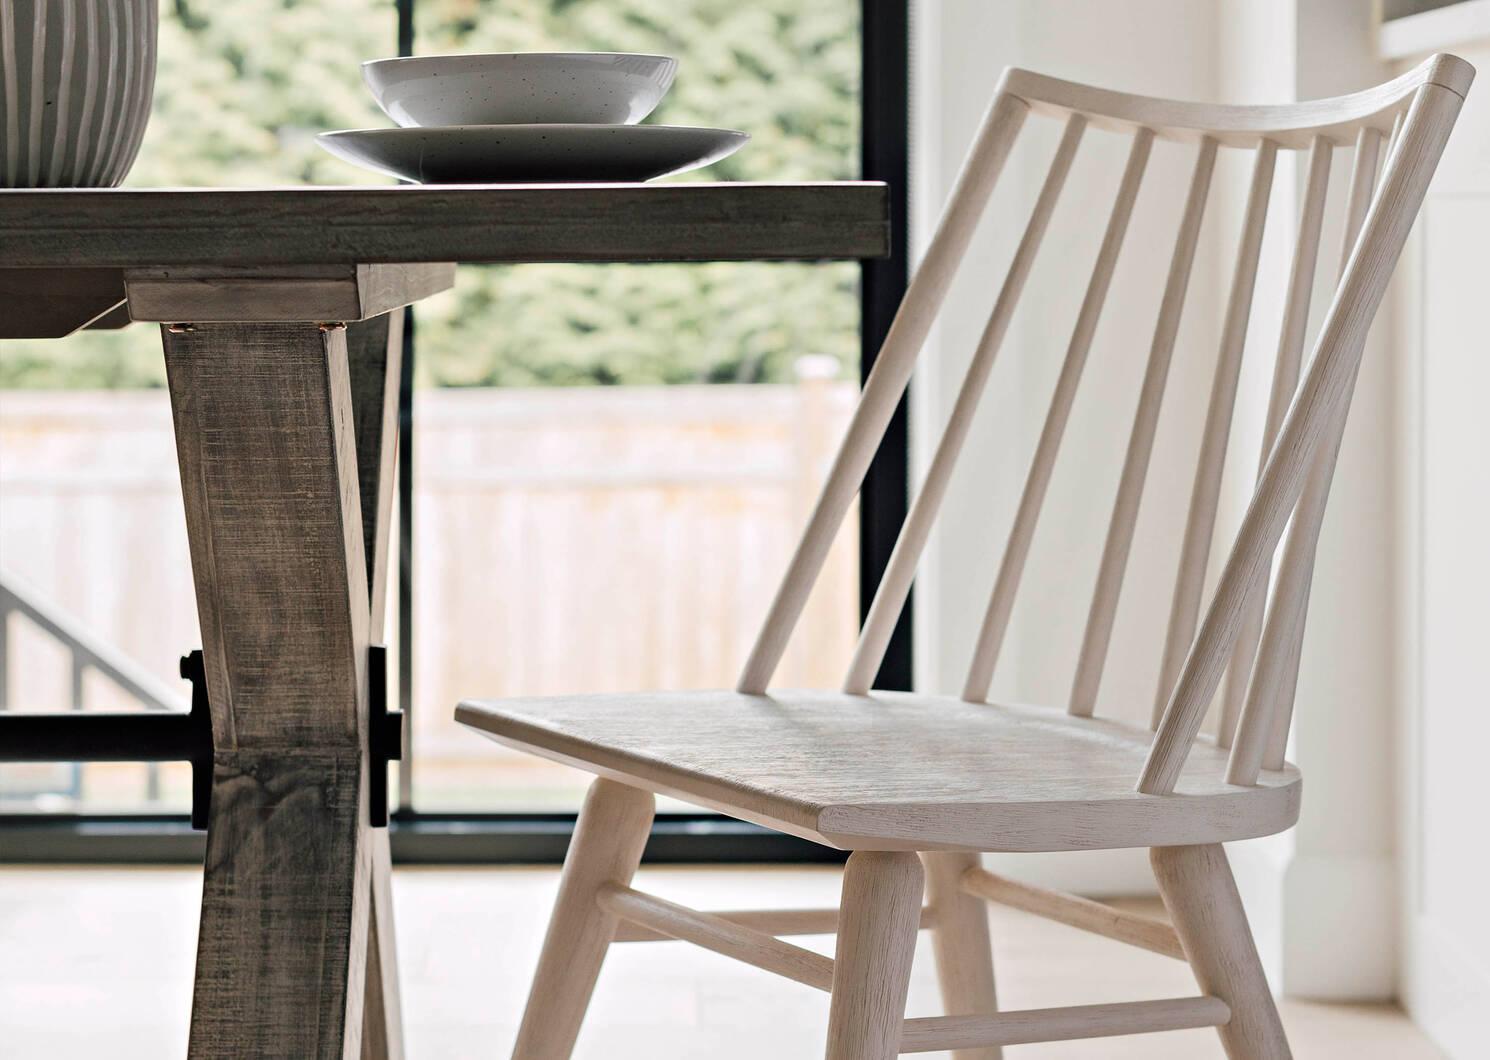 Hershel Dining Chair -Yvie Chantilly